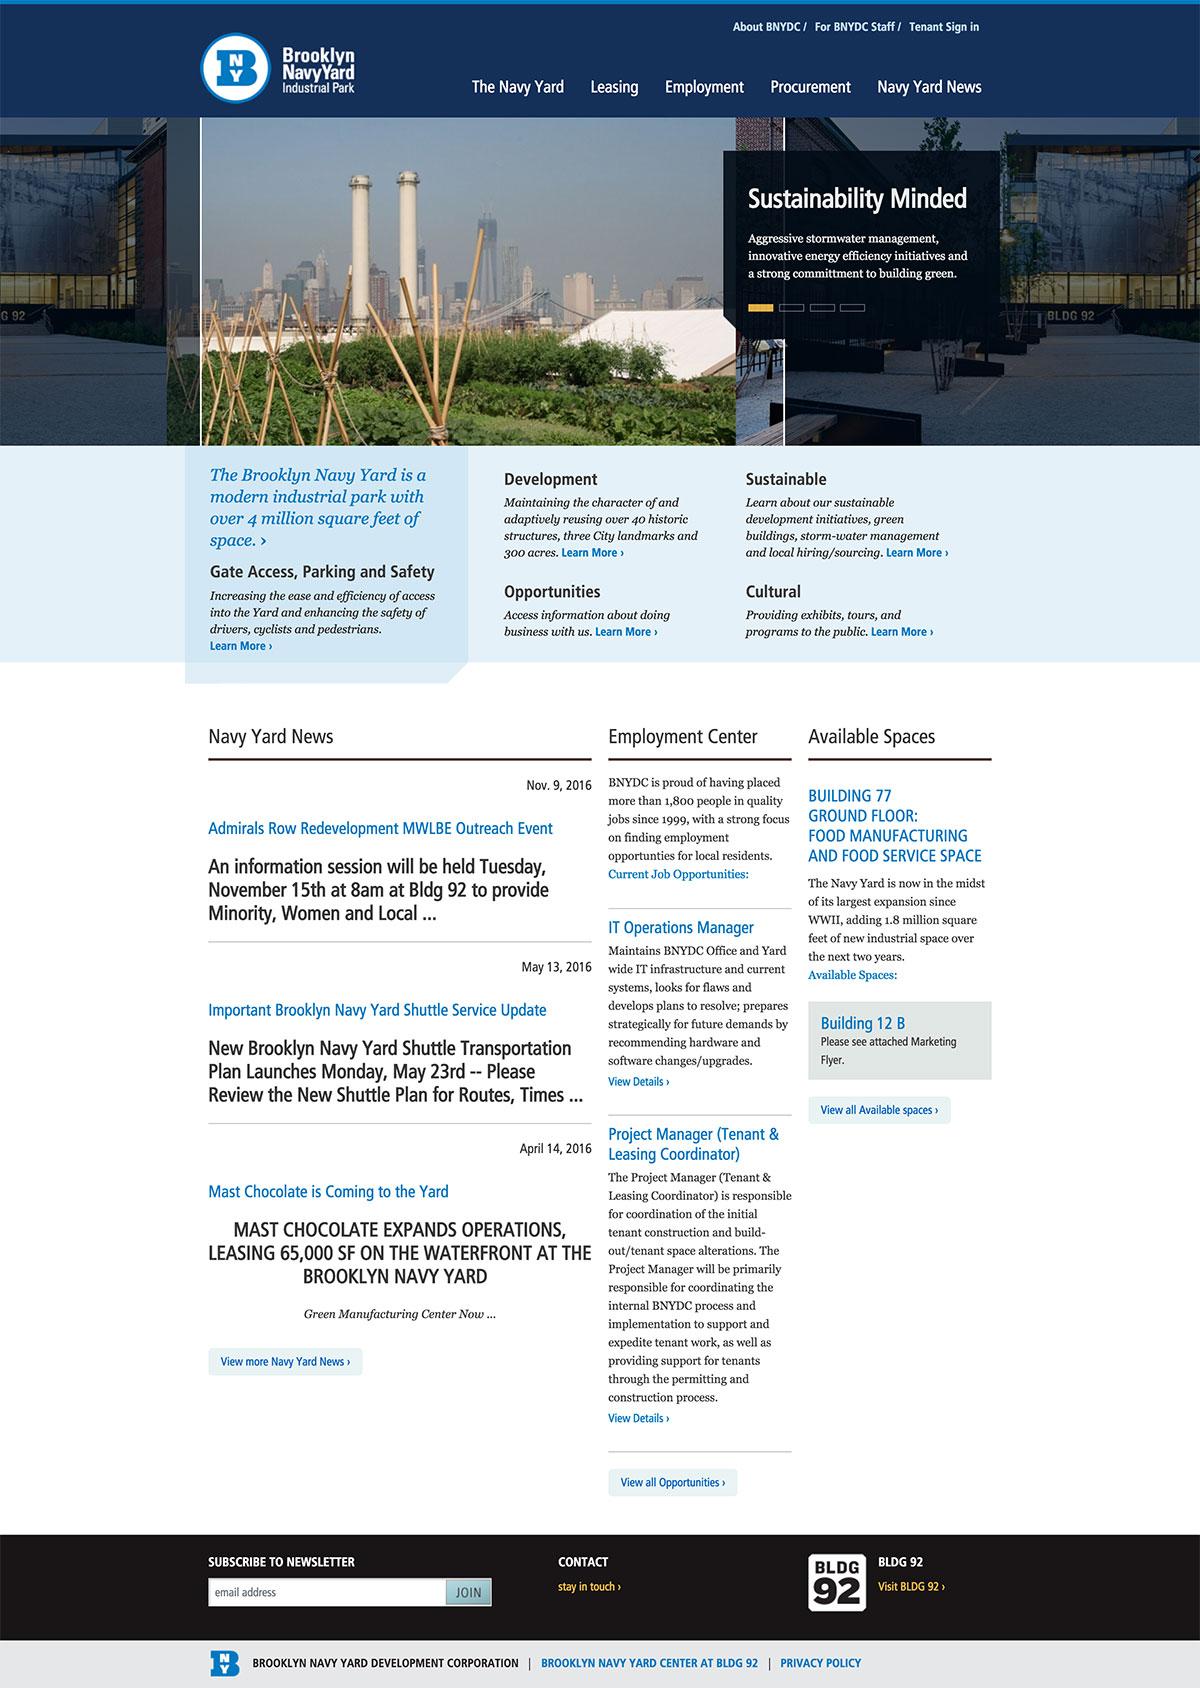 BROOKLYN NAVY YARD website